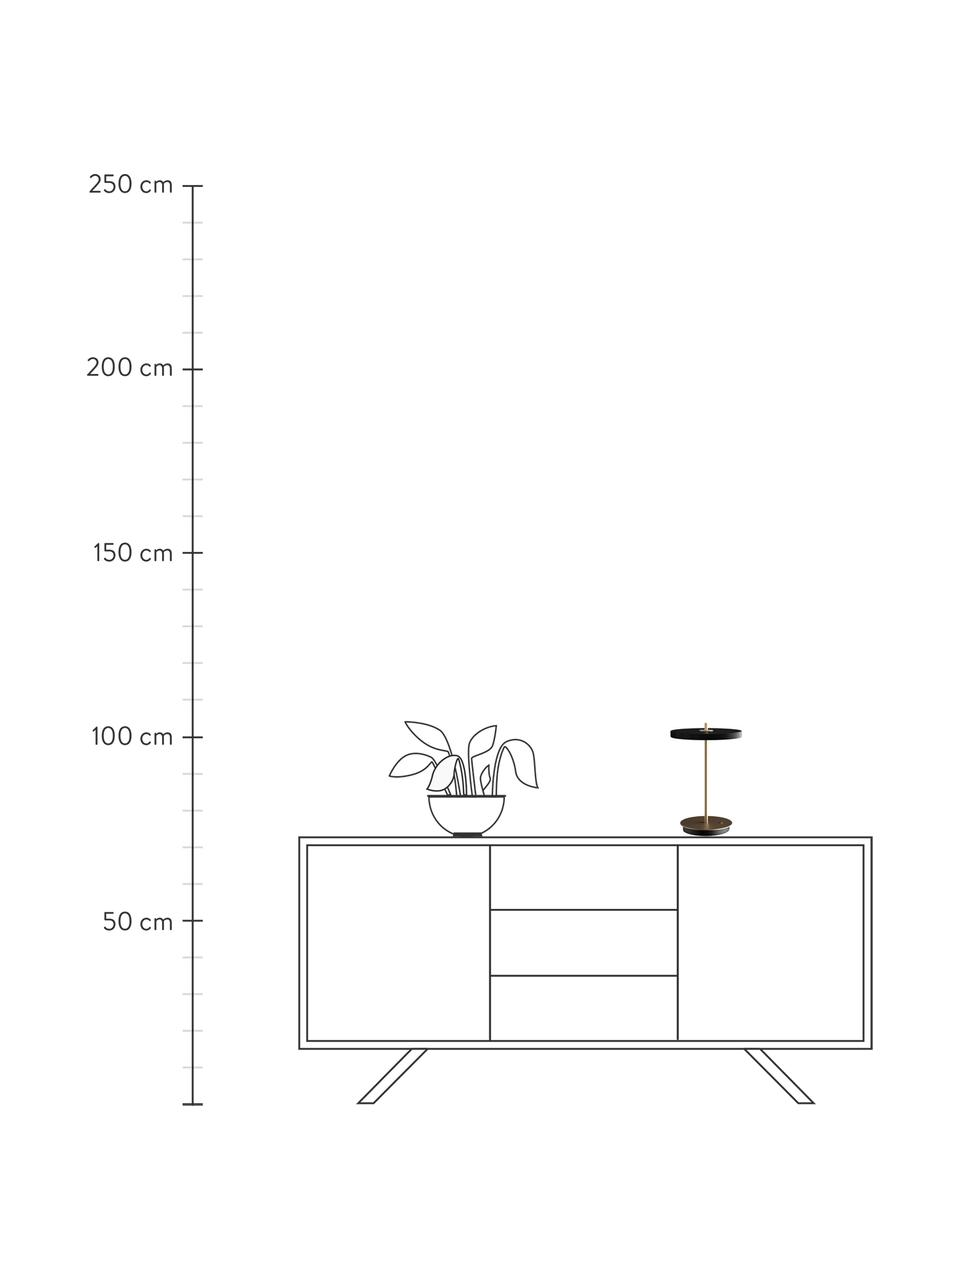 Kleine Mobile Dimmbare LED-Tischlampe Asteria, Lampenschirm: Aluminium, beschichtet, Lampenfuß: Stahl, beschichtet, Schwarz, Ø 20 x H 31 cm